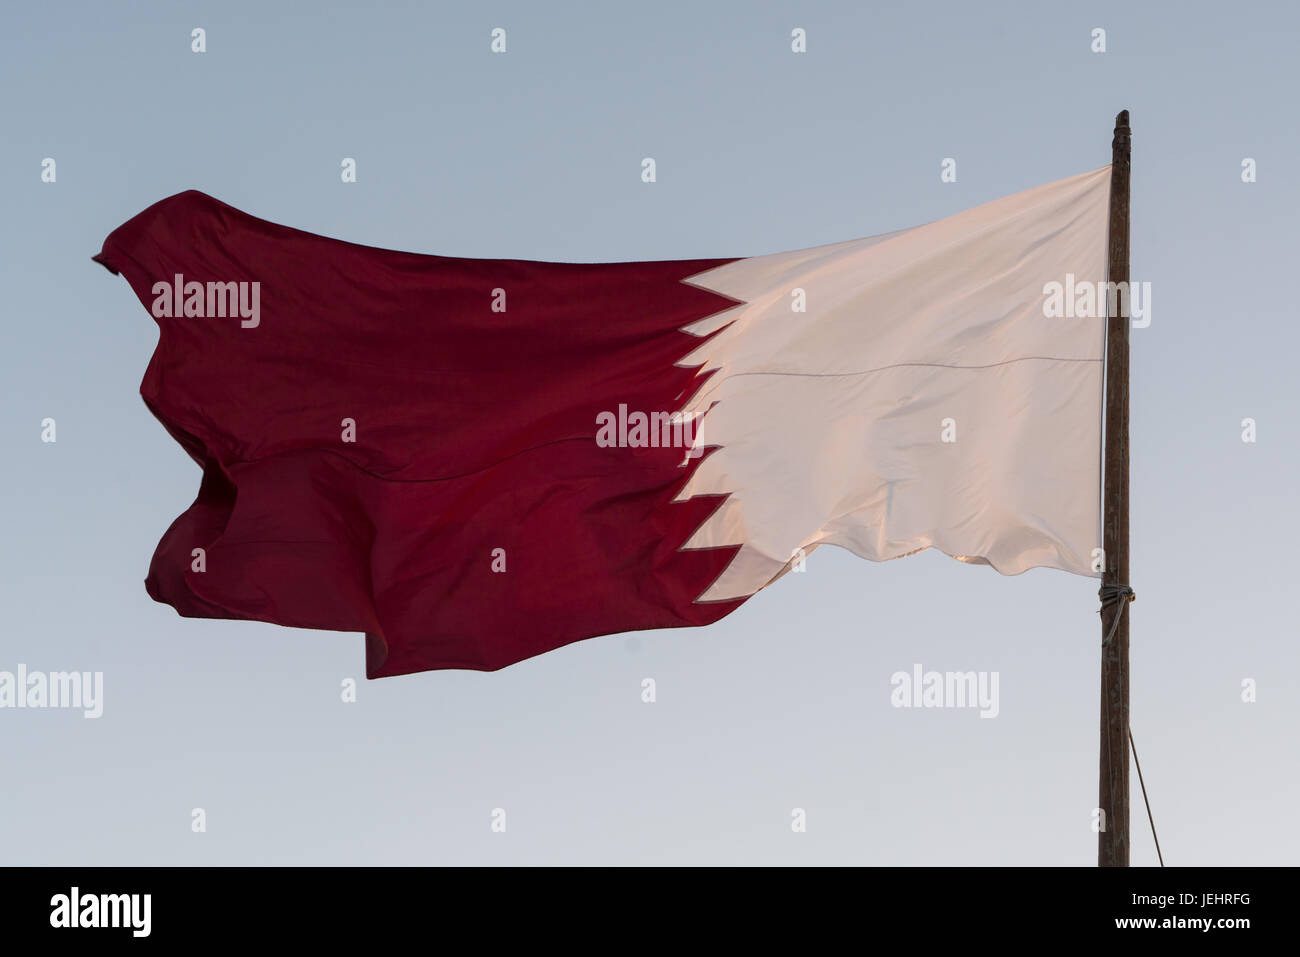 Qatari flag - Stock Image